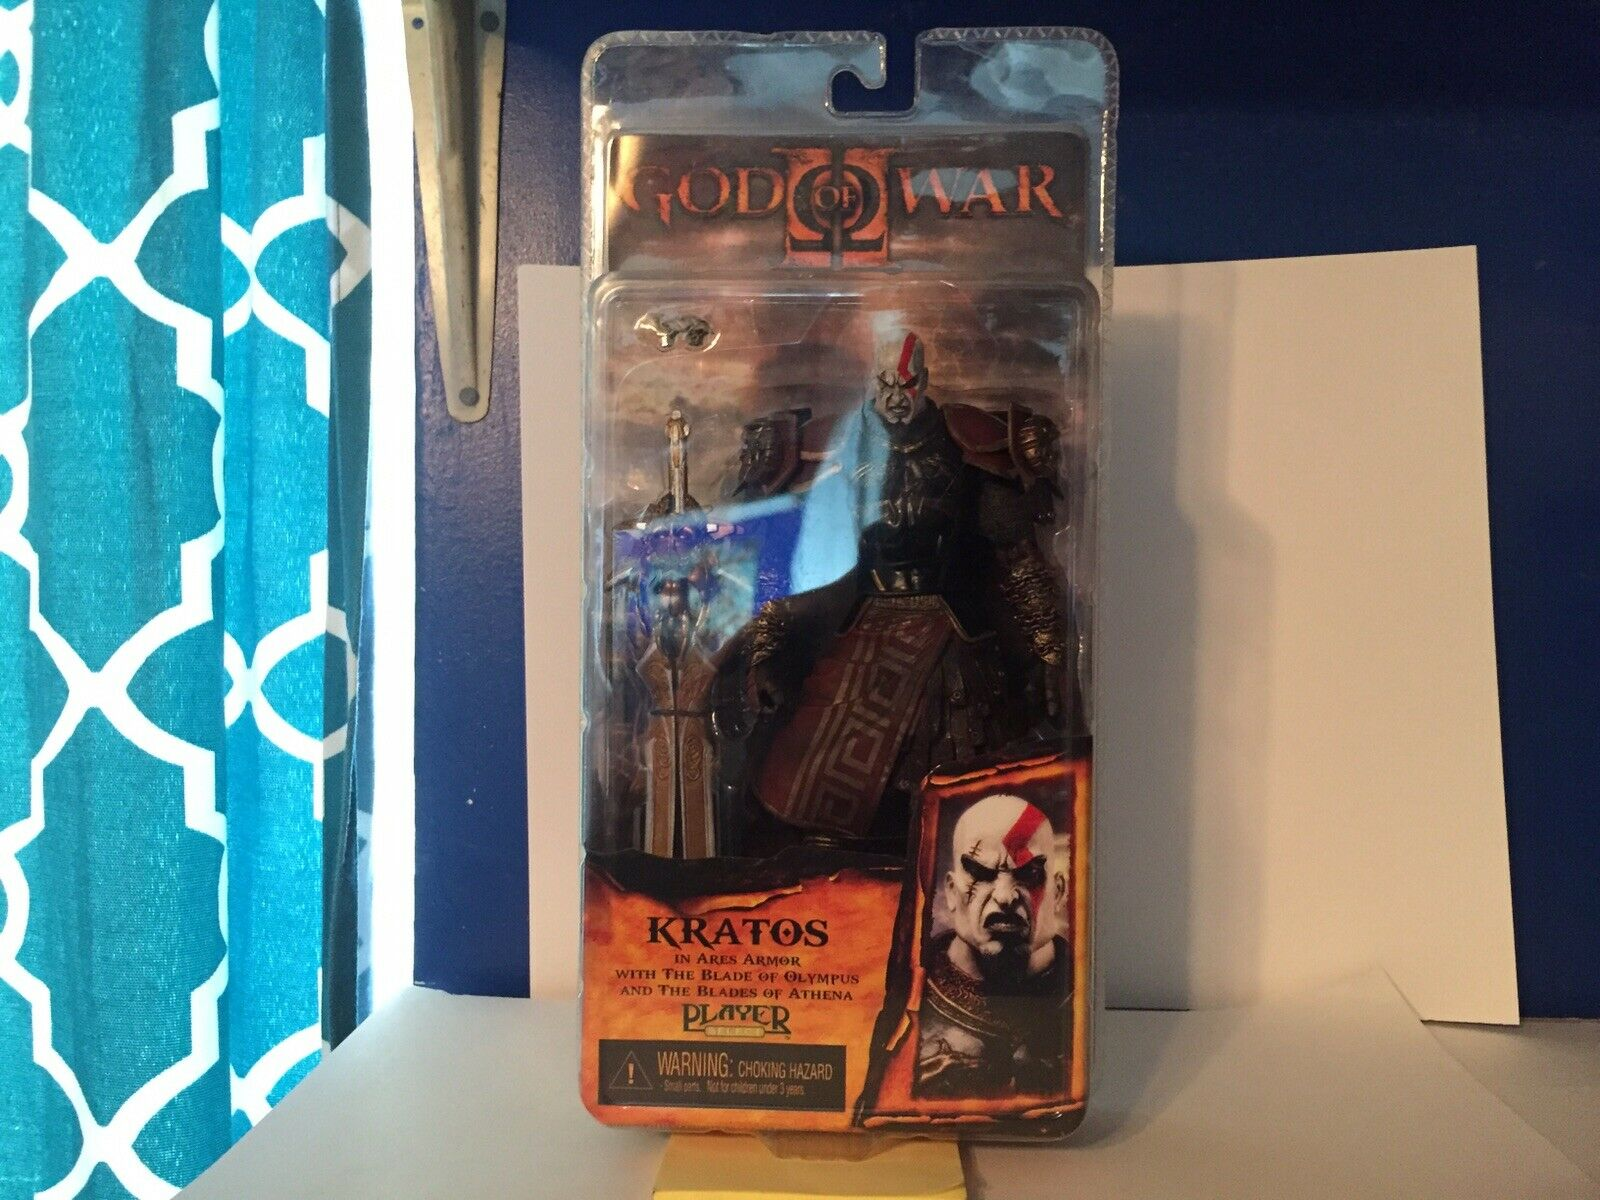 NECA God of War 2 Kratos azione cifra [Ares Armor, Version 2]